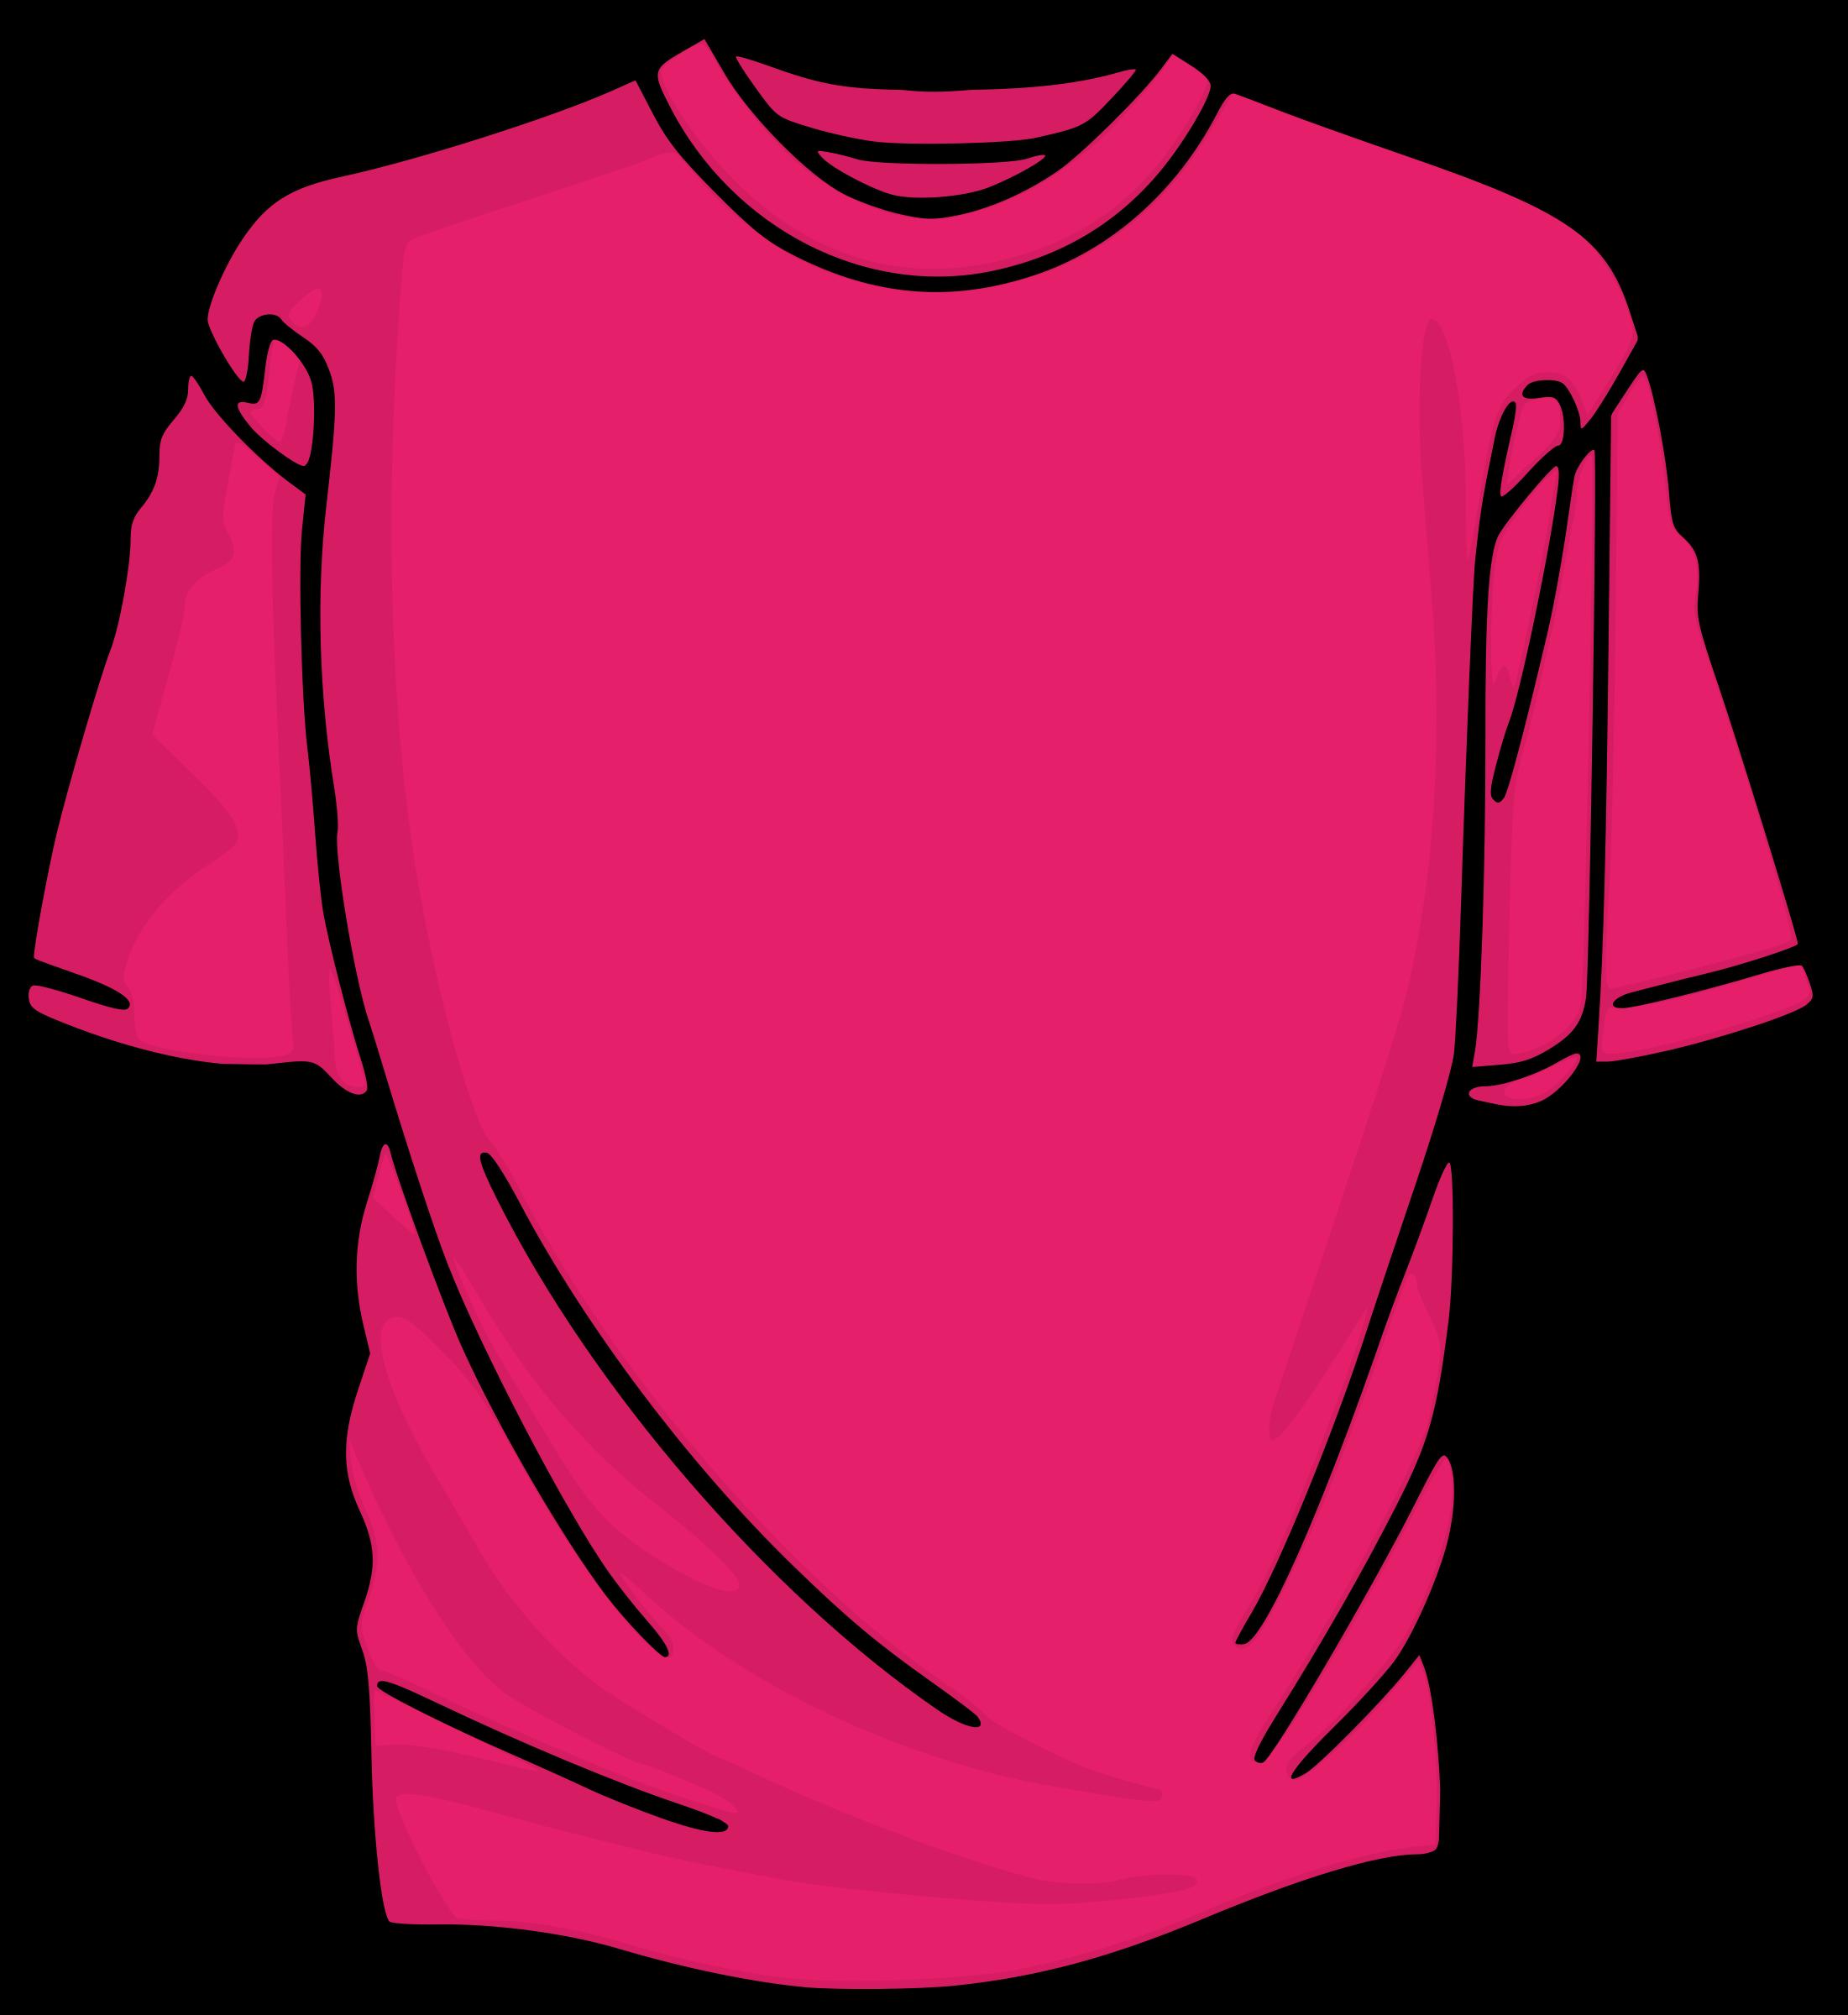 clip freeuse download Pink t big image. Tshirt clipart neon shirt